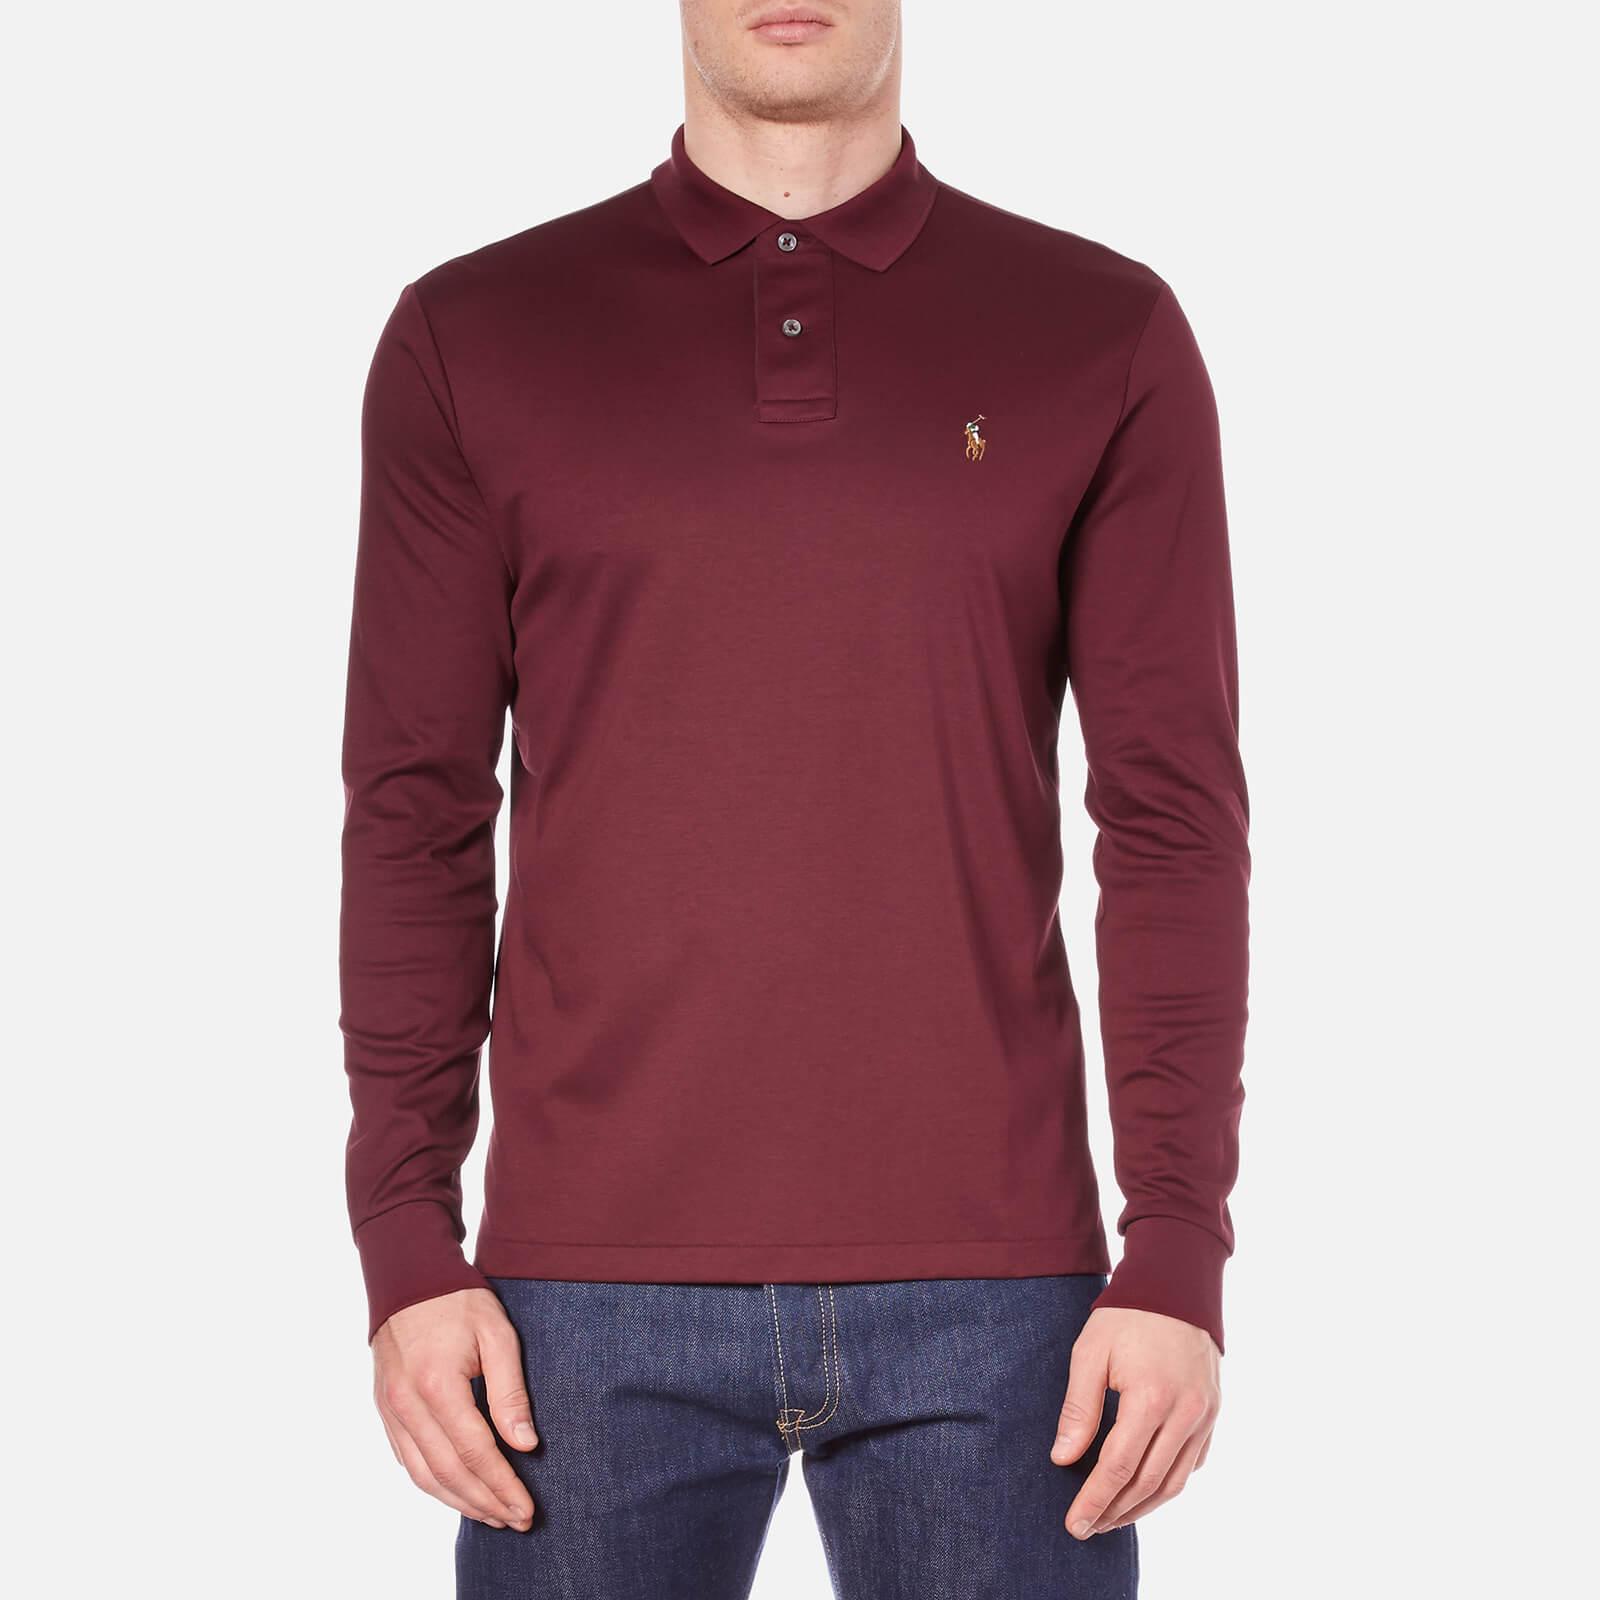 e31da426c Polo Ralph Lauren Men s Long Sleeve Custom Fit Polo Shirt - Classic Wine -  Free UK Delivery over £50